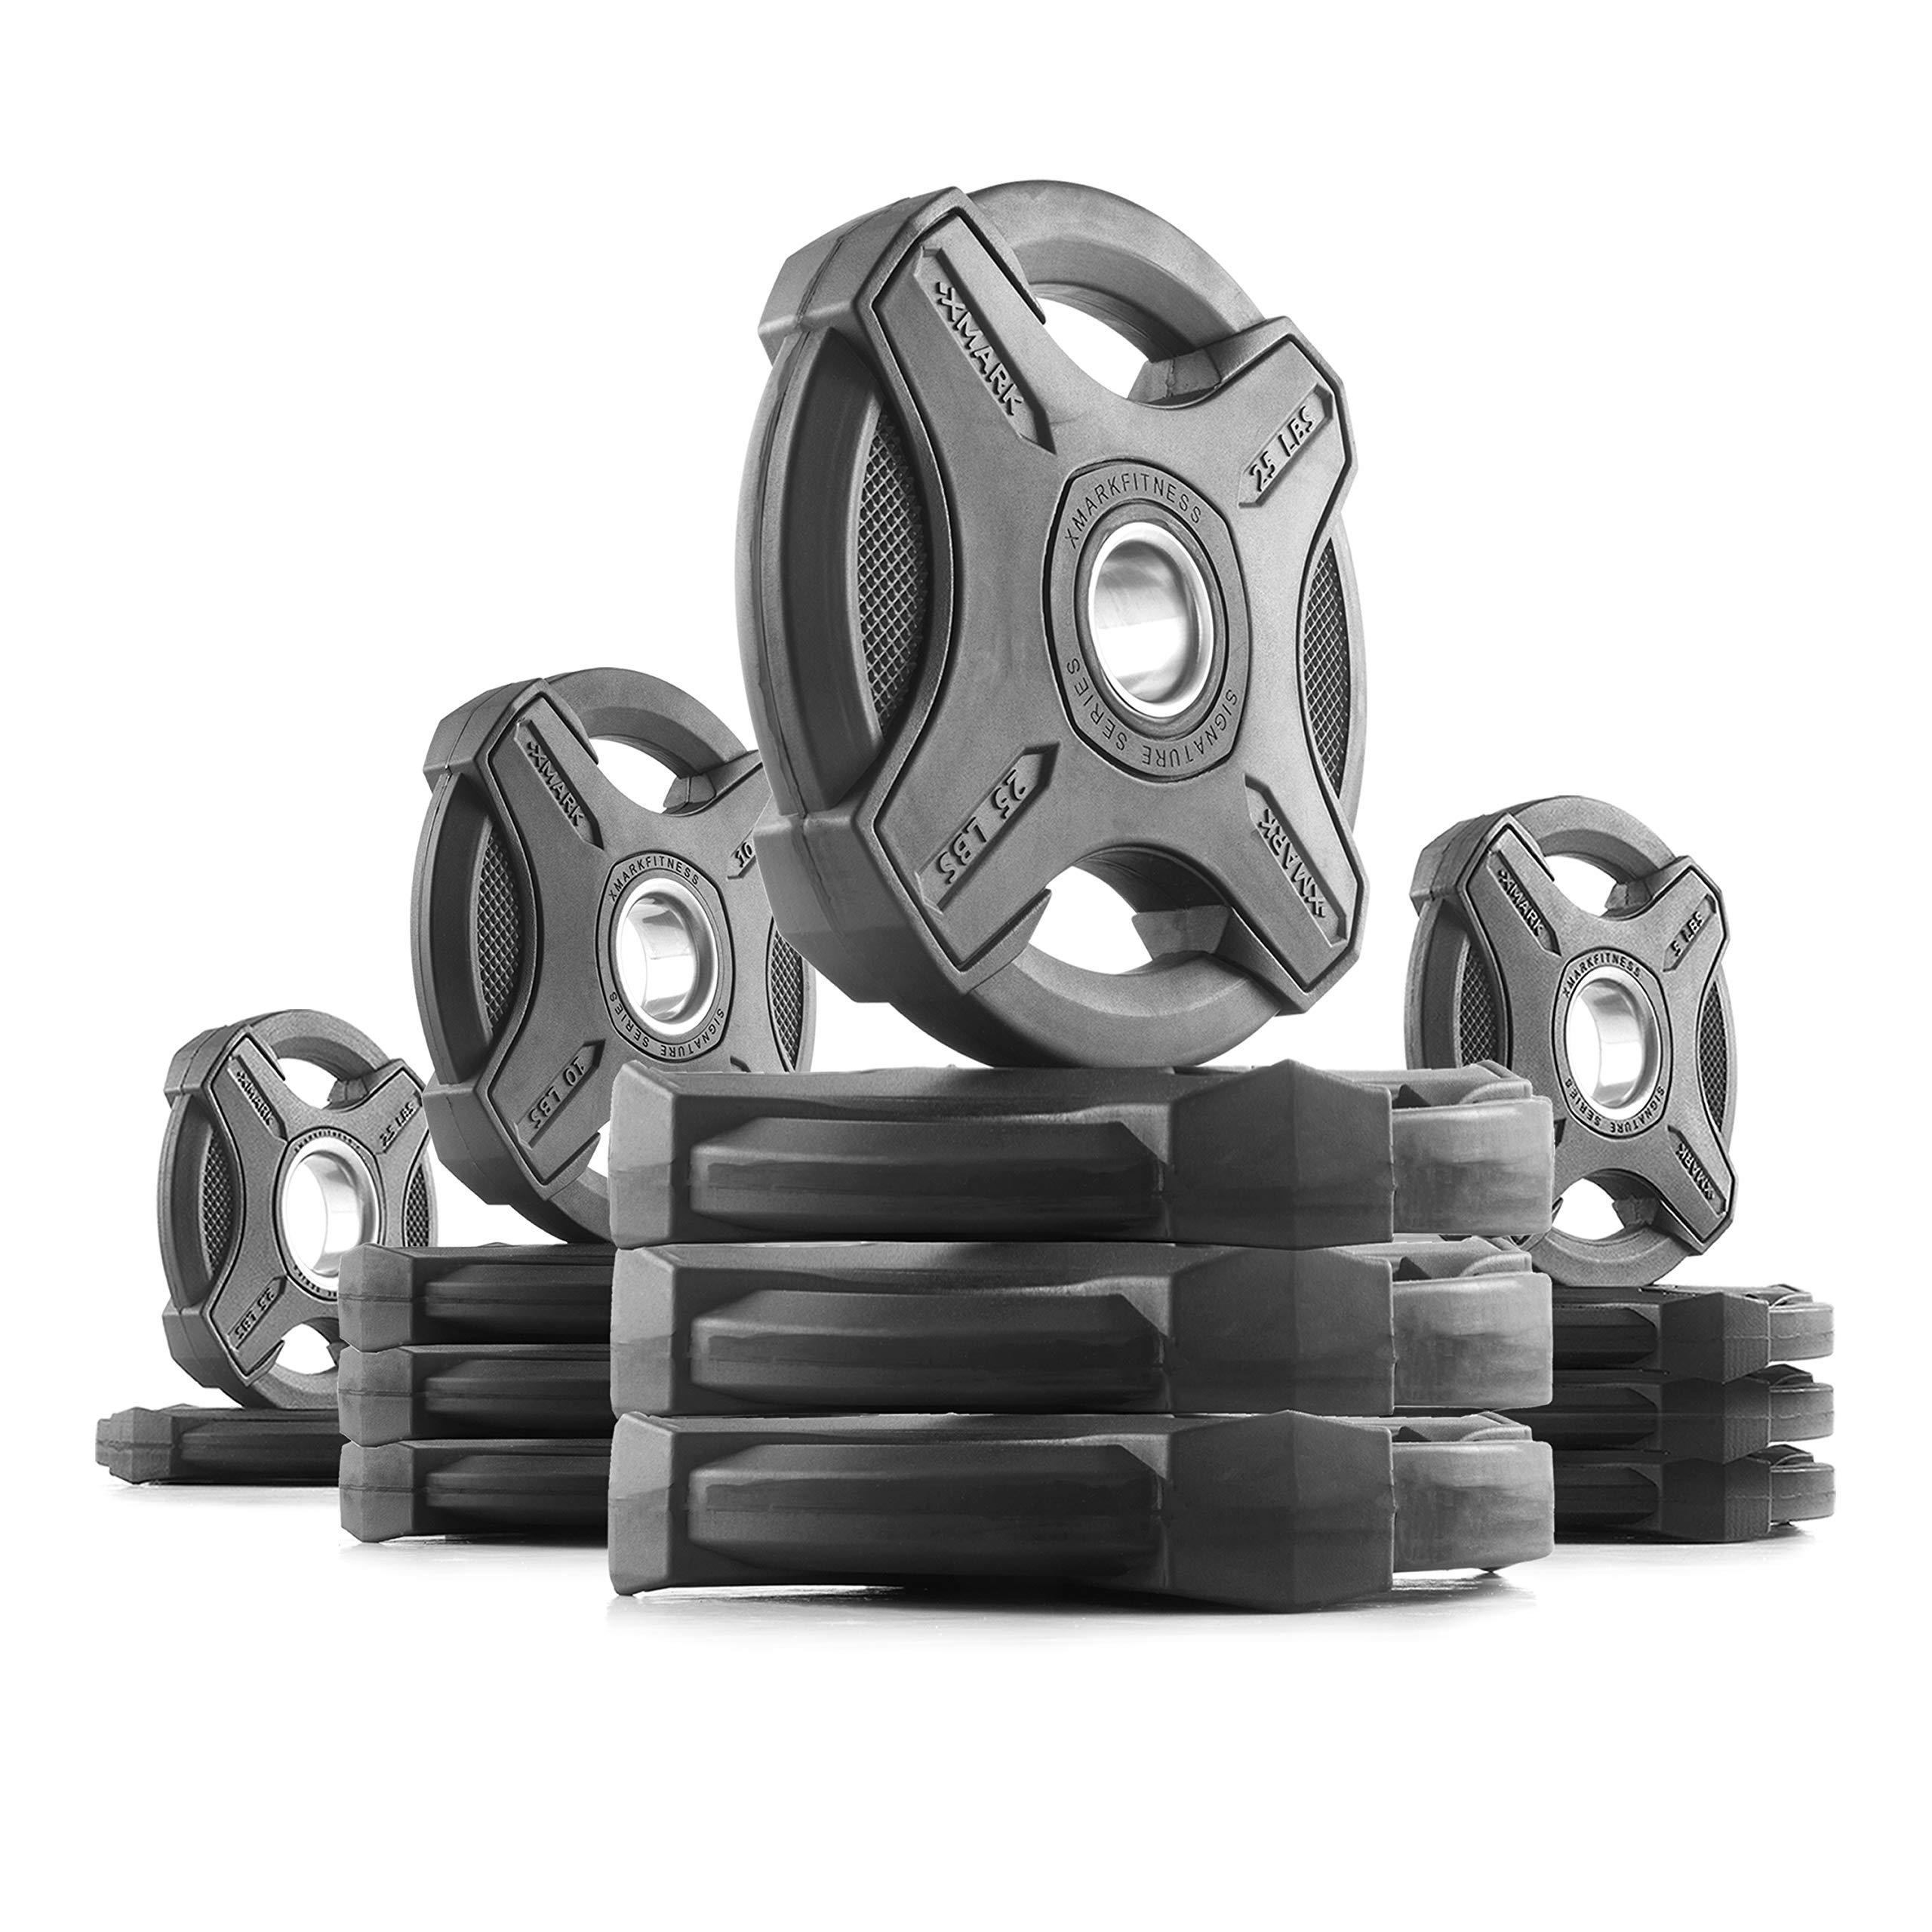 XMark 165 lb Set Signature Plates, One-Year Warranty, Olympic Weight Plates, Cutting-Edge Design